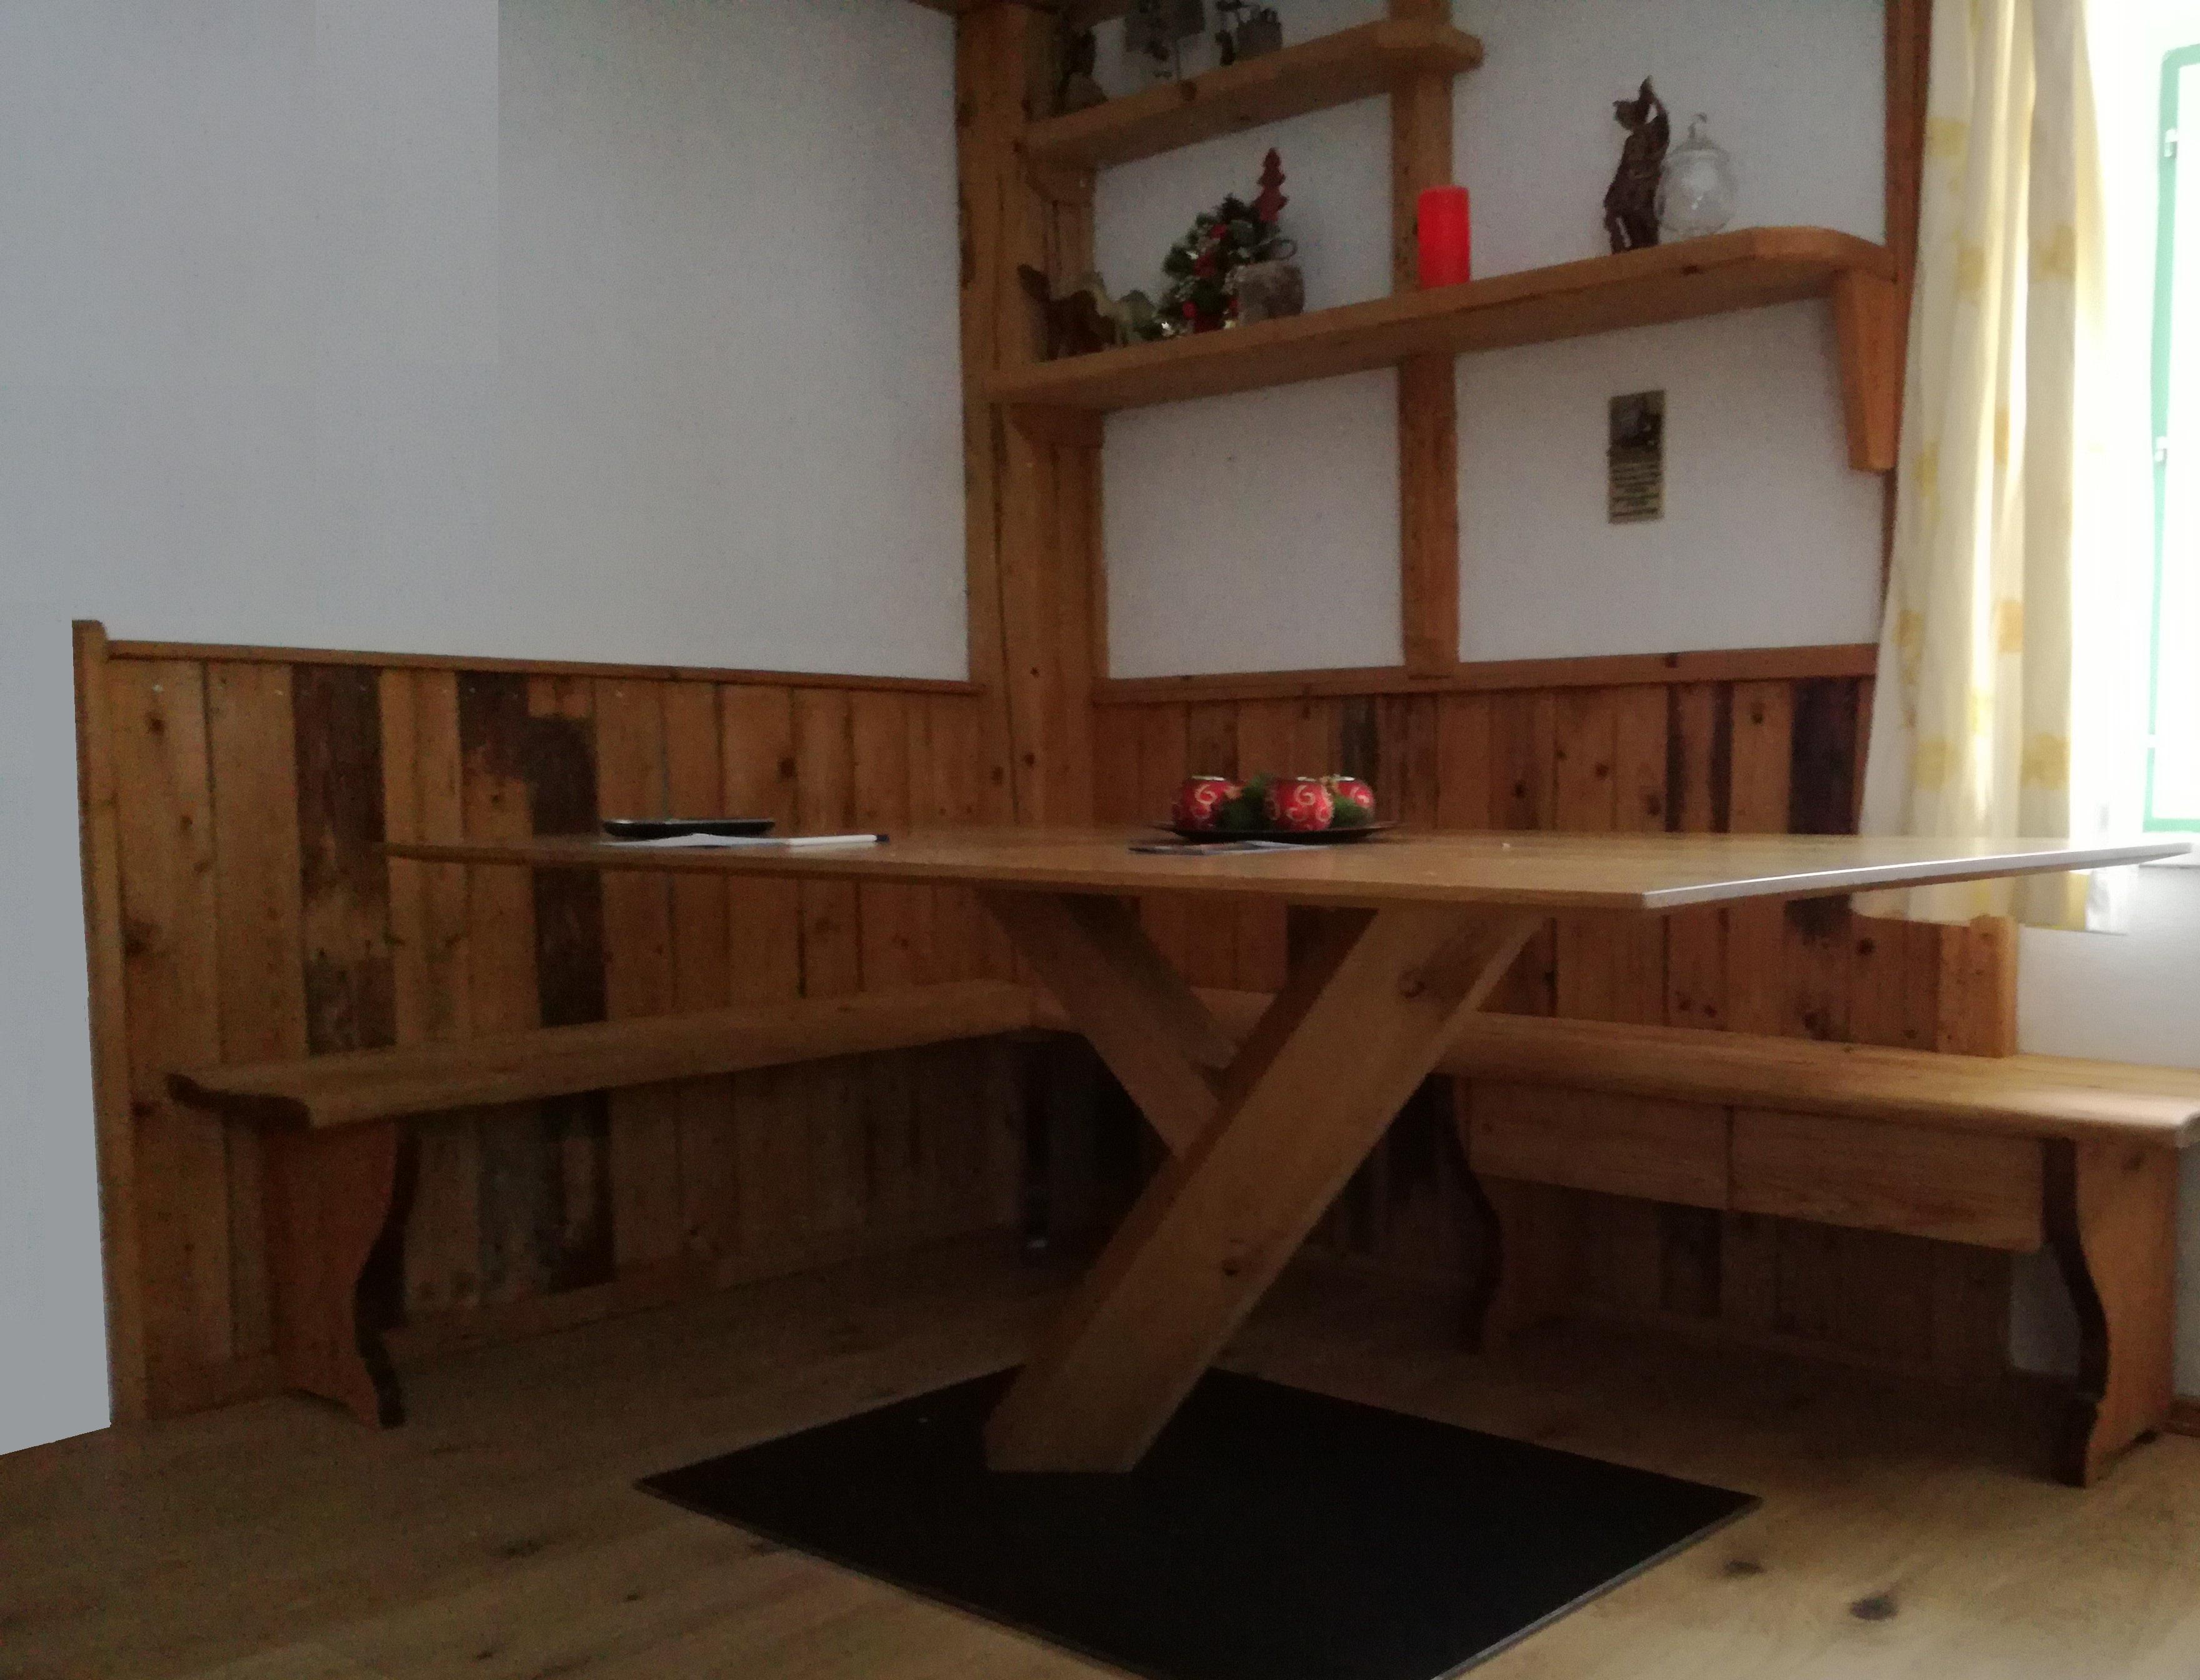 Tisch mit Ybbsilongestell